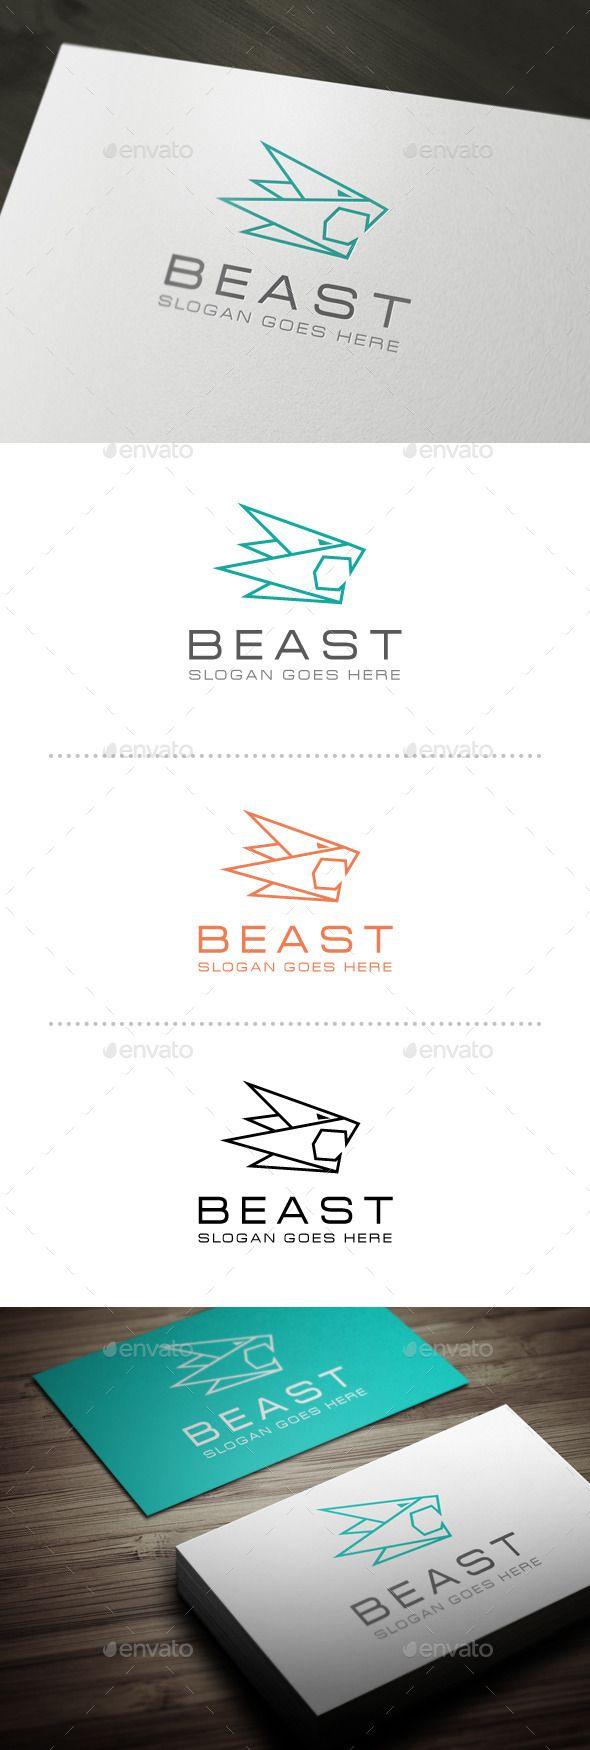 #Beast #logo #Template #animals #design #logotype